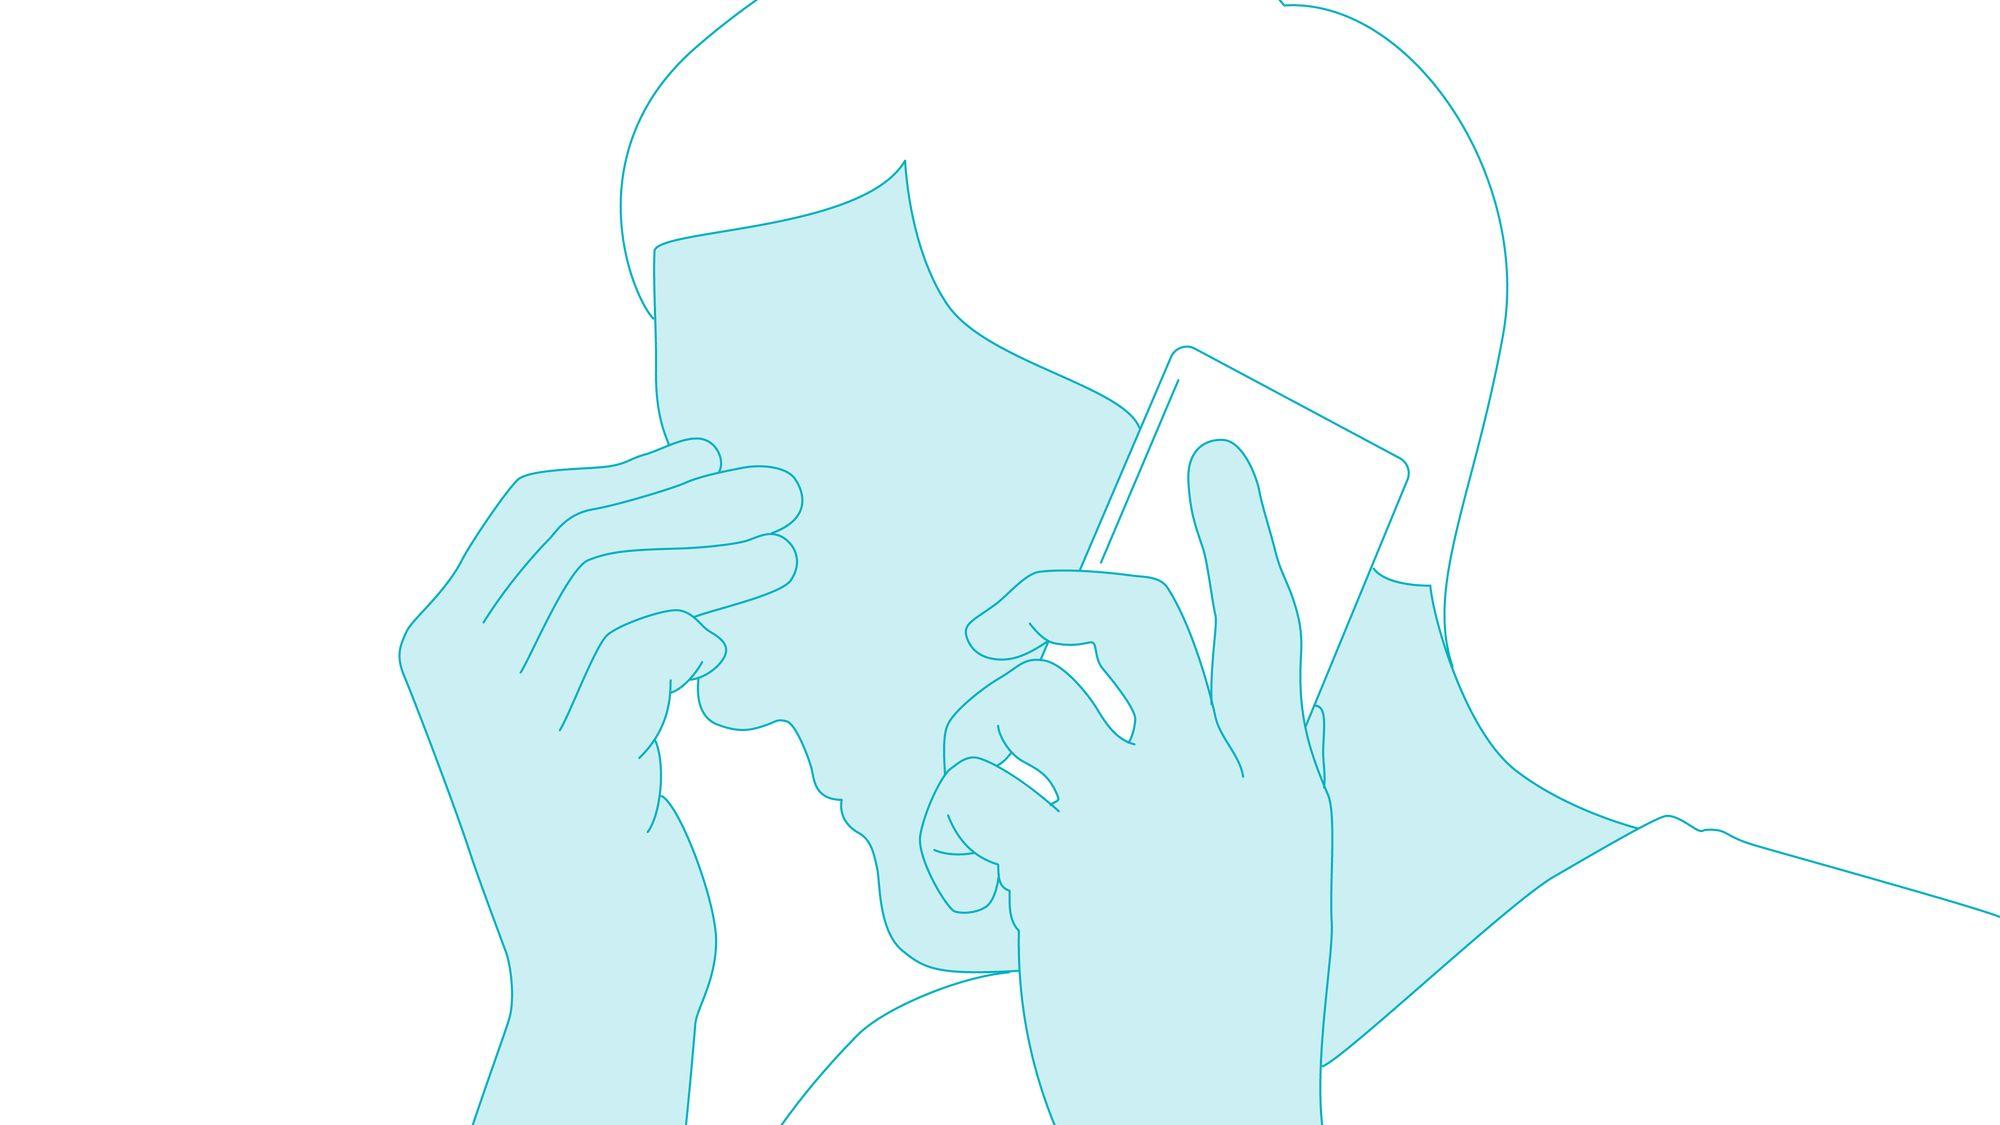 std symptoms in men